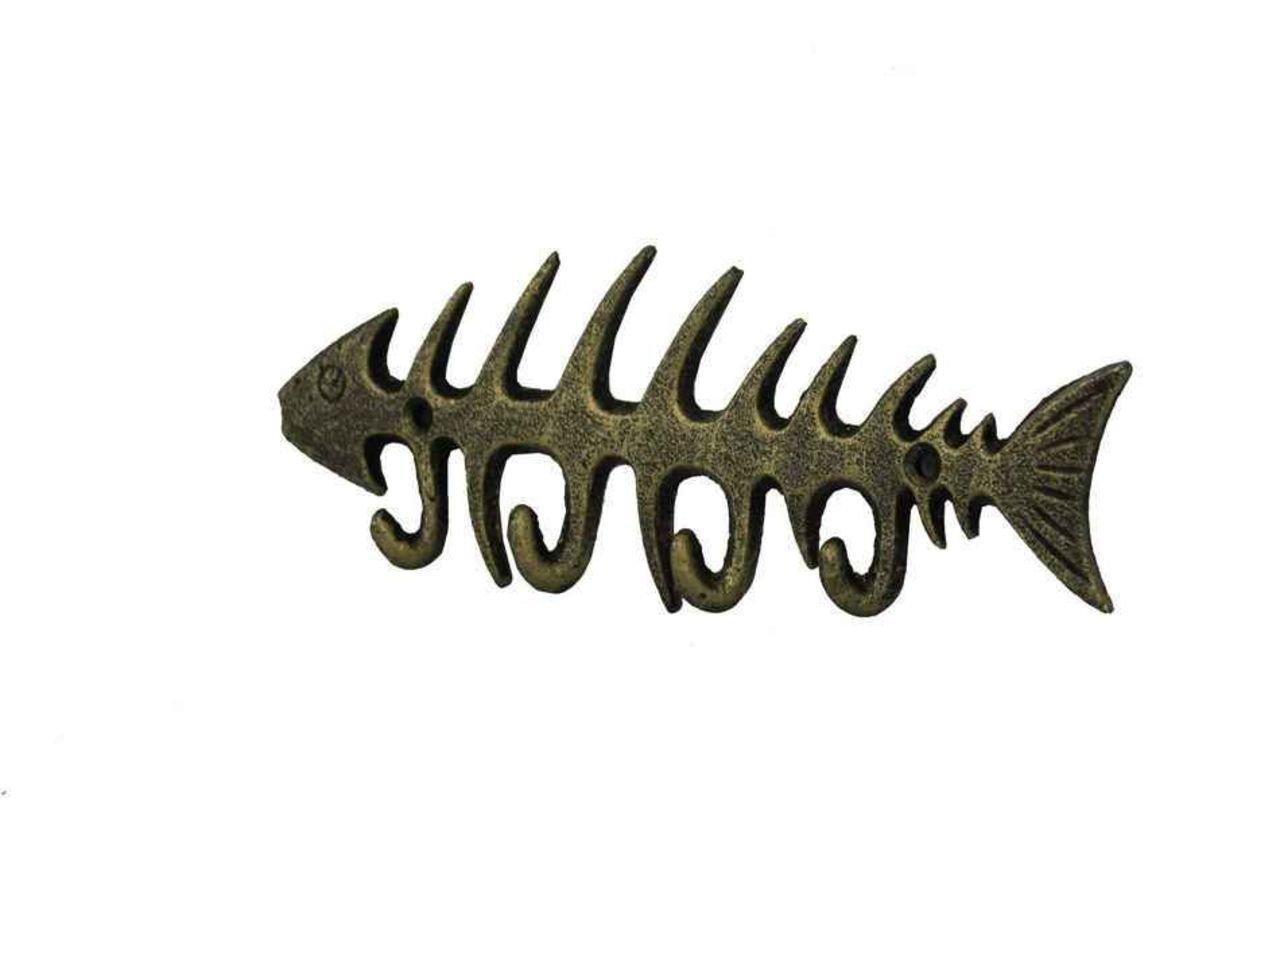 Hampton Nautical  Cast Iron Fish Bone Rustic Wall Art Key Rack Antique White 8 Handcrafted Nautical Decor K-0407-AW 8